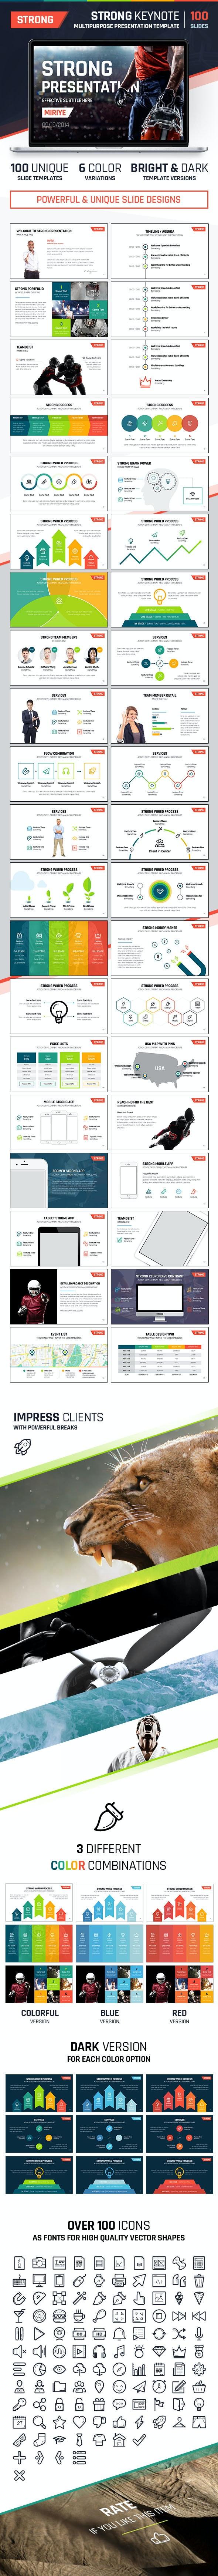 Strong Keynote - Multipurpose Presentation - Keynote Templates Presentation Templates